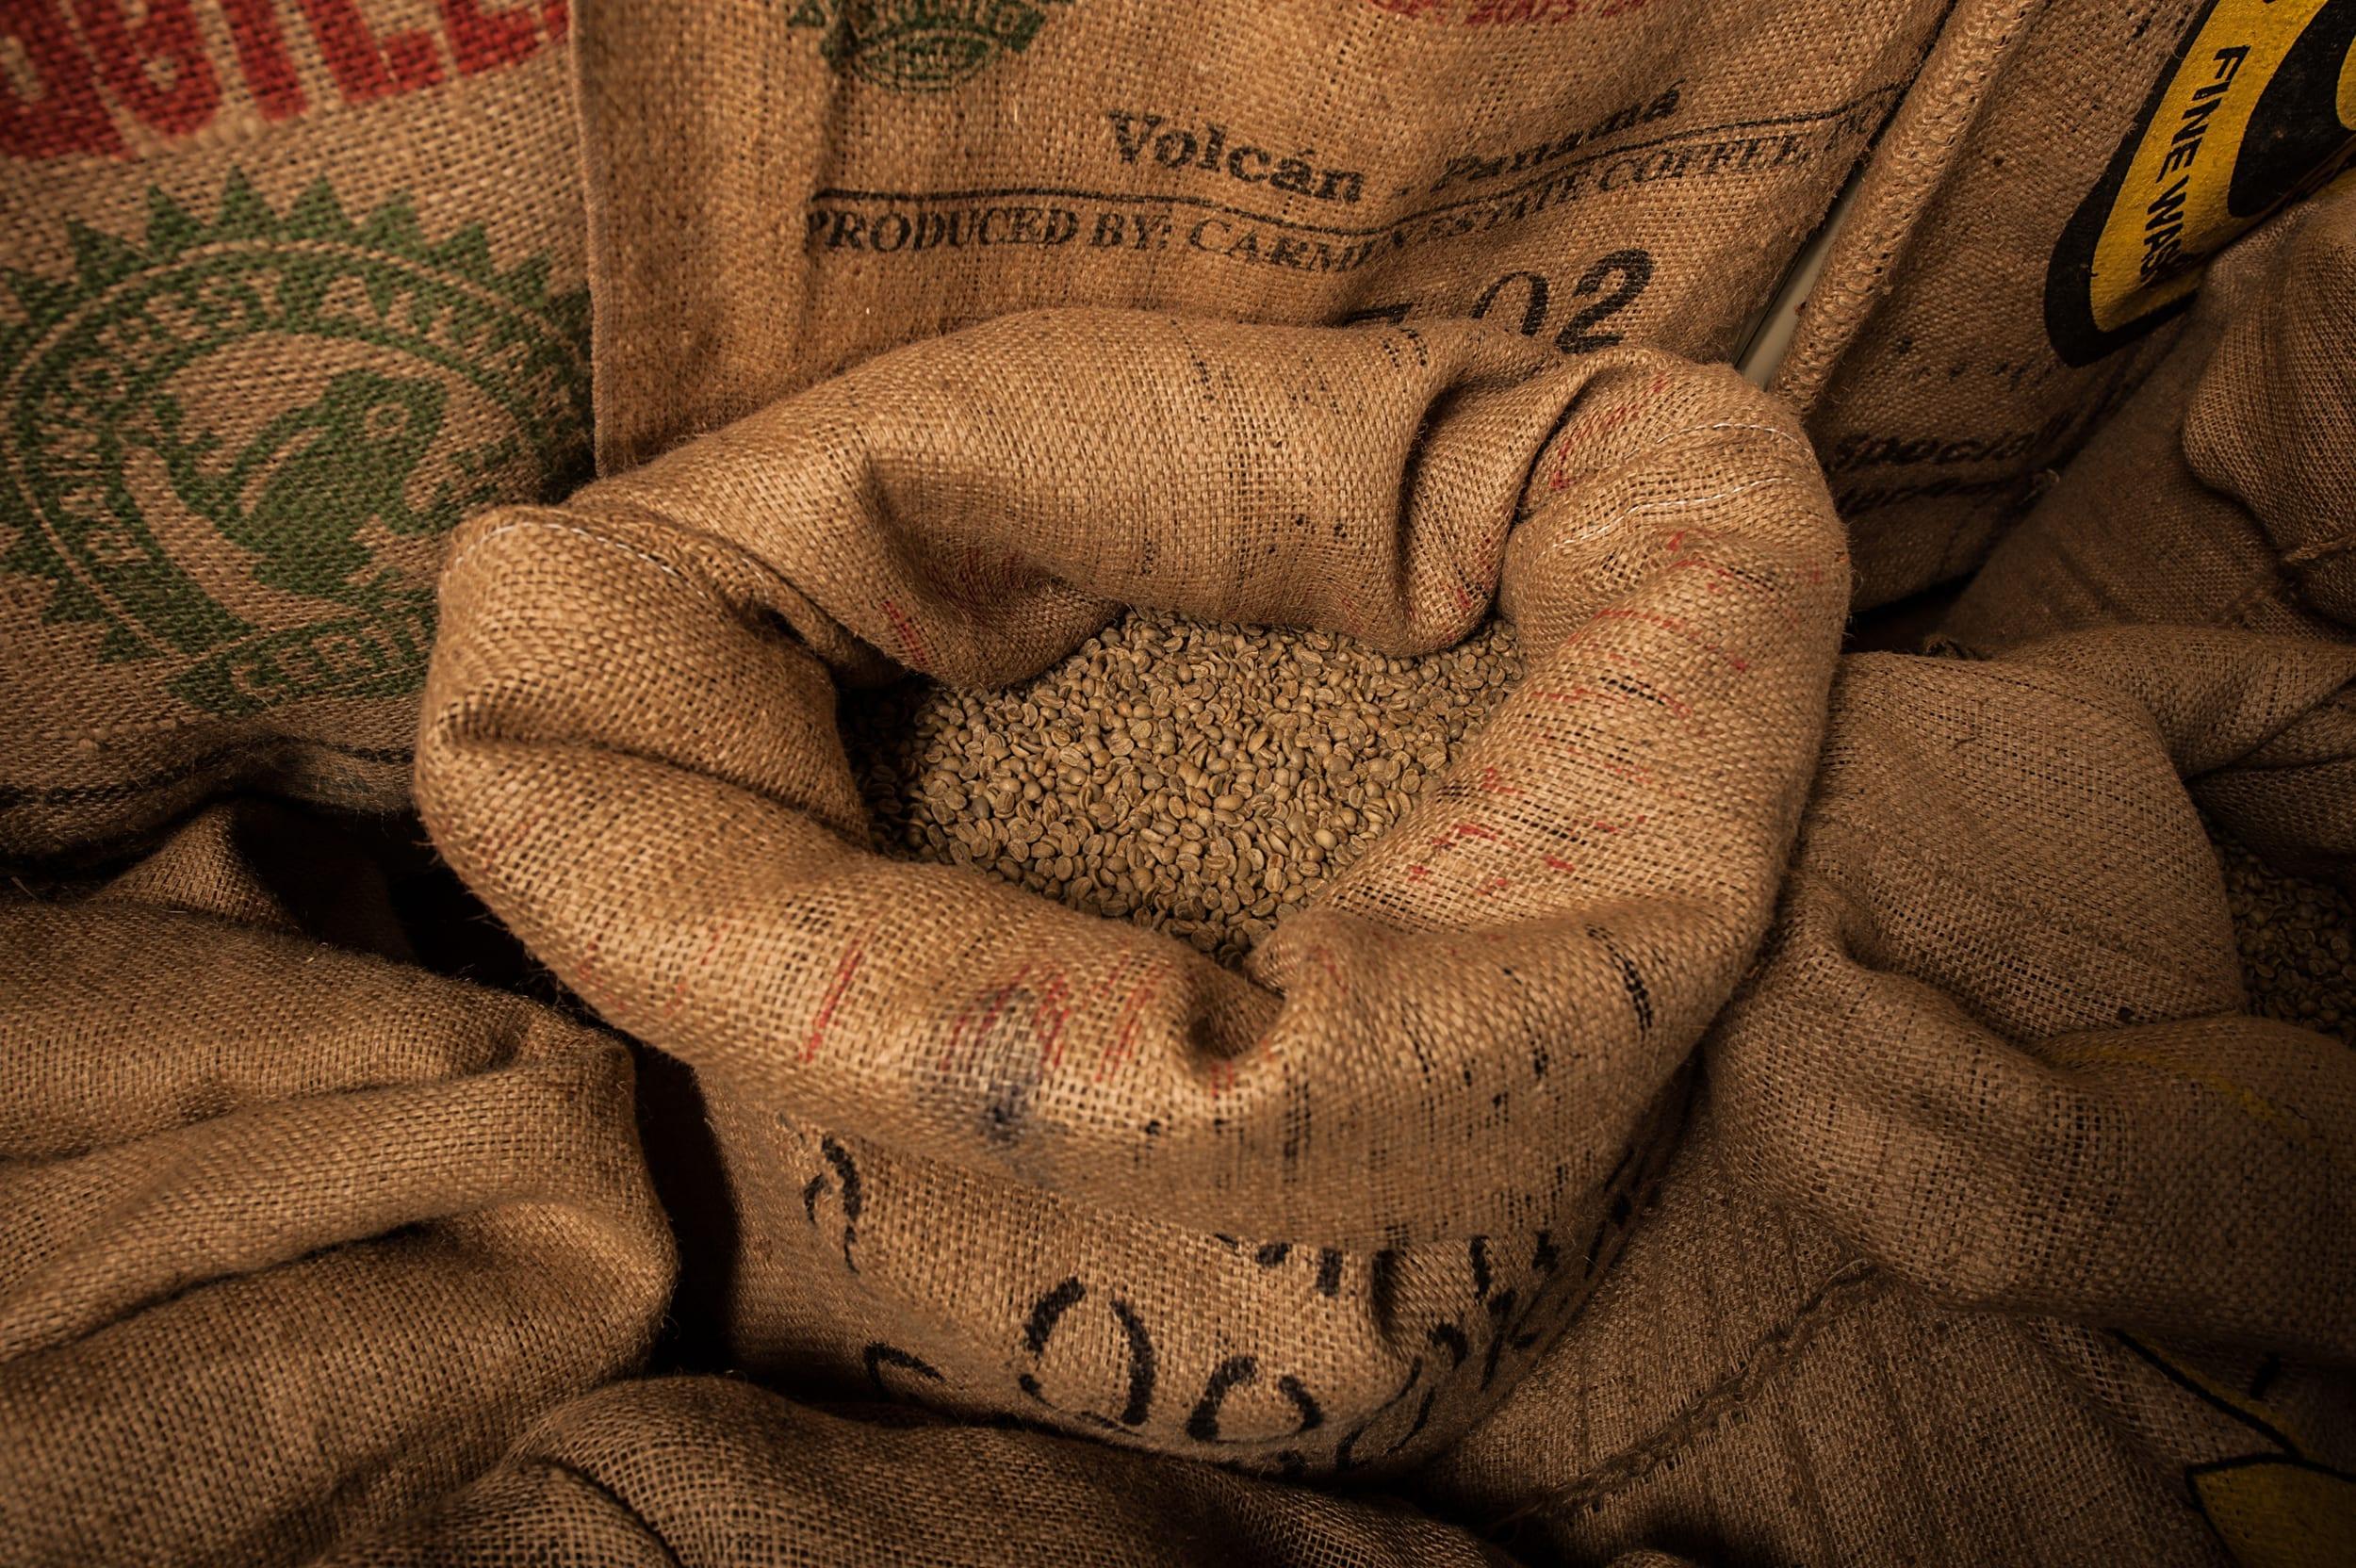 Explorercoffee, Rohkaffee aus aller Welt